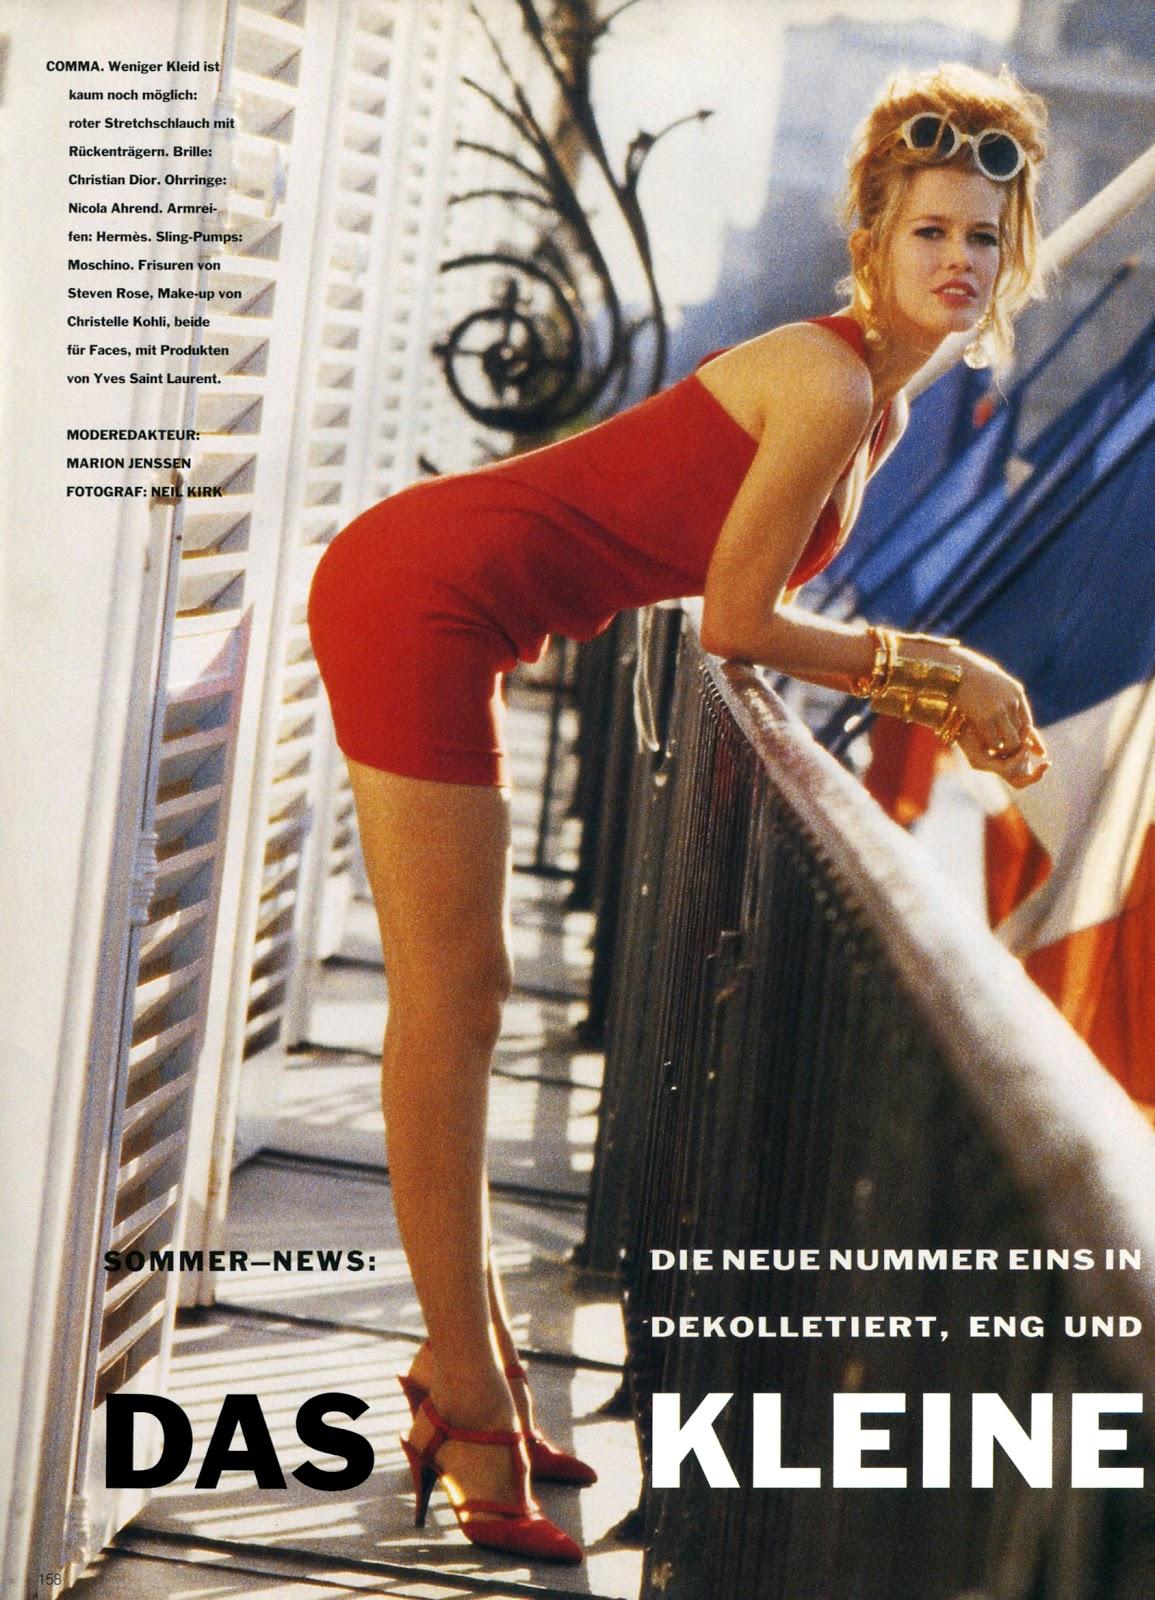 Vogue (Germany) January 1991 | Das Kleine 01.jpg